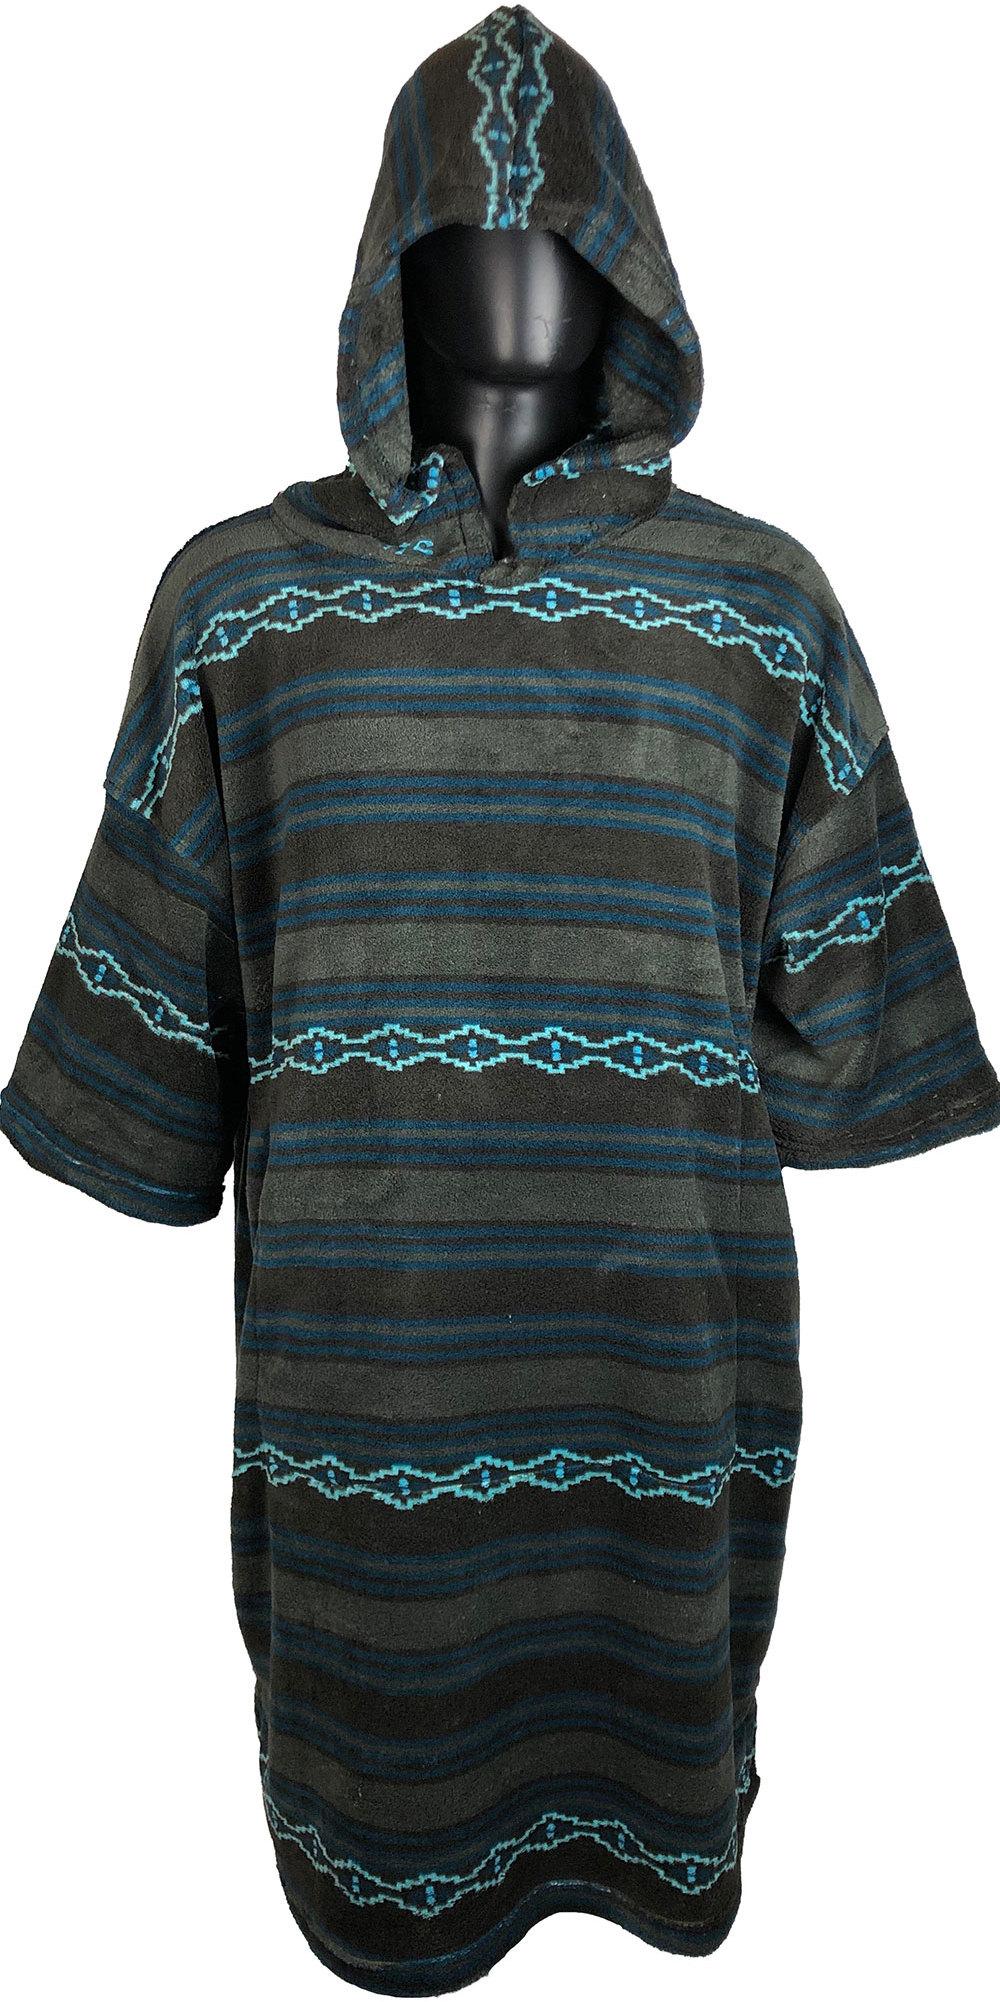 2019 TLS Hooded Poncho / Change Robe Bohemian Stripe